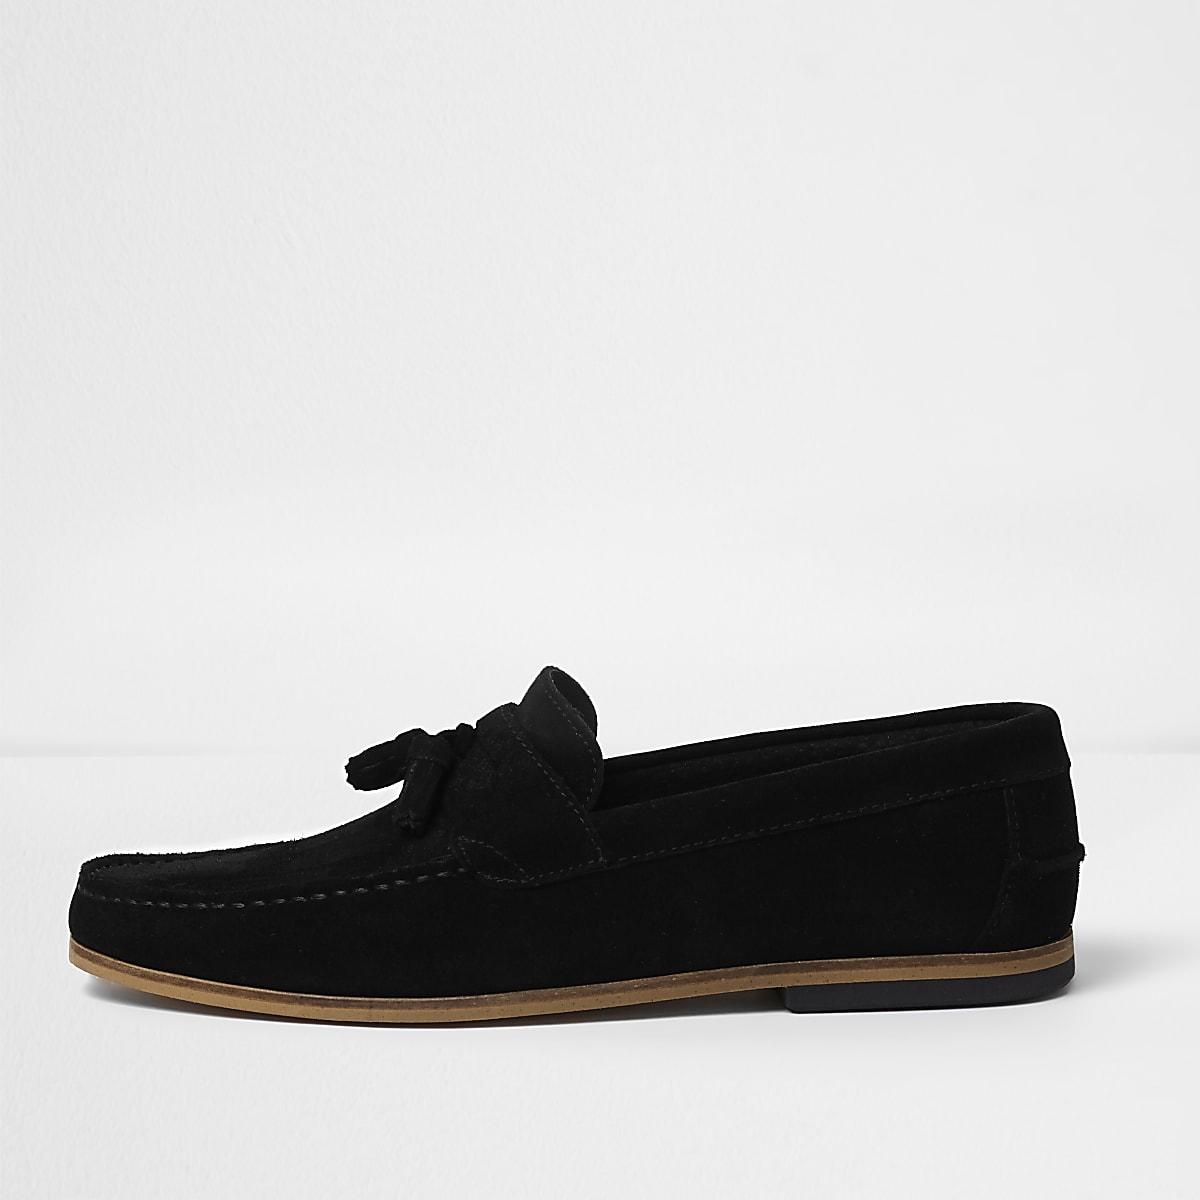 Black wide fit suede tassel loafers